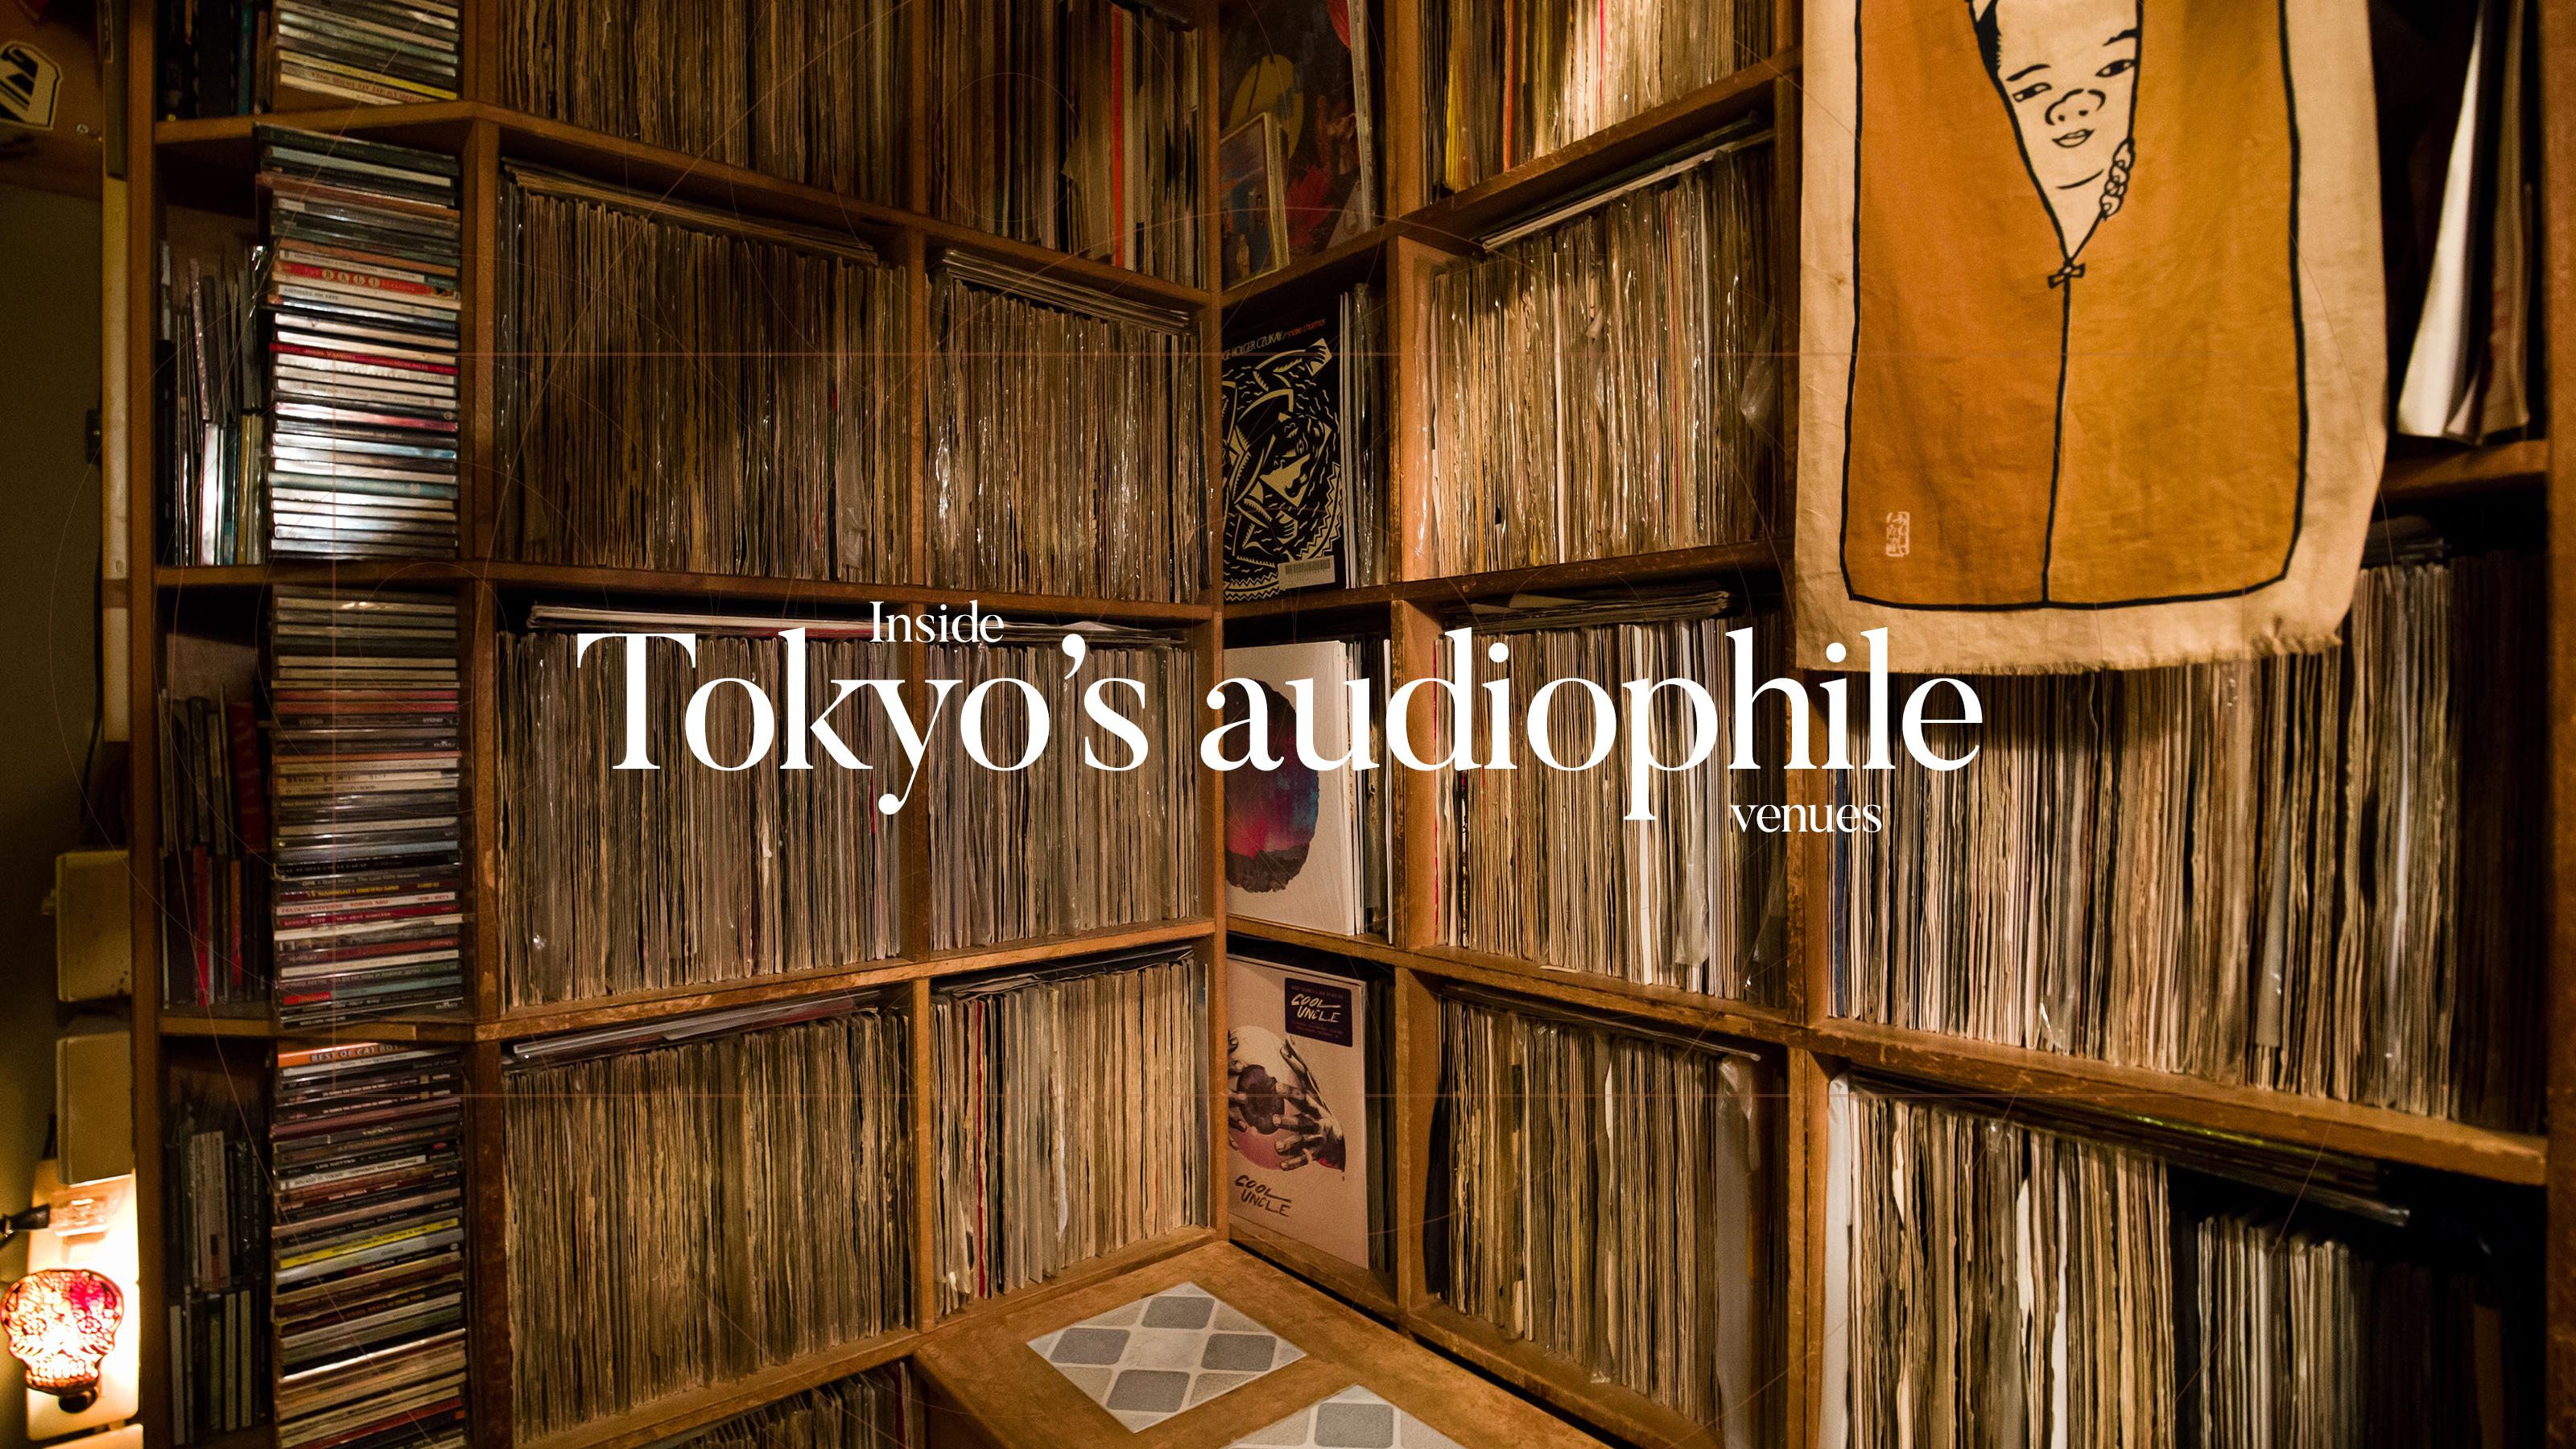 RA: Inside Tokyo's audiophile venues